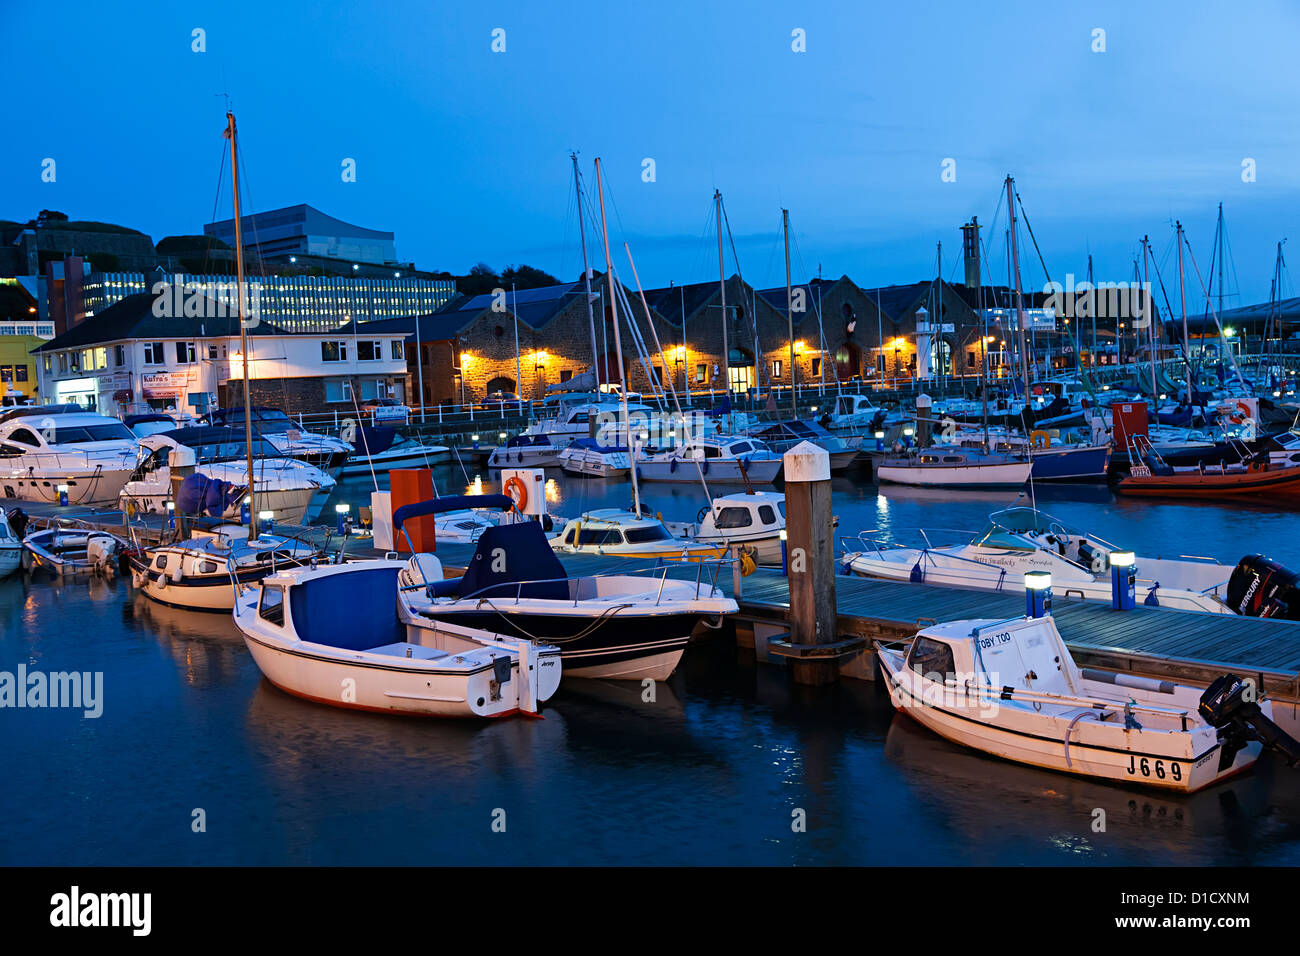 Marina at dusk, St Helier, Jersey, Channel Islands, UK - Stock Image